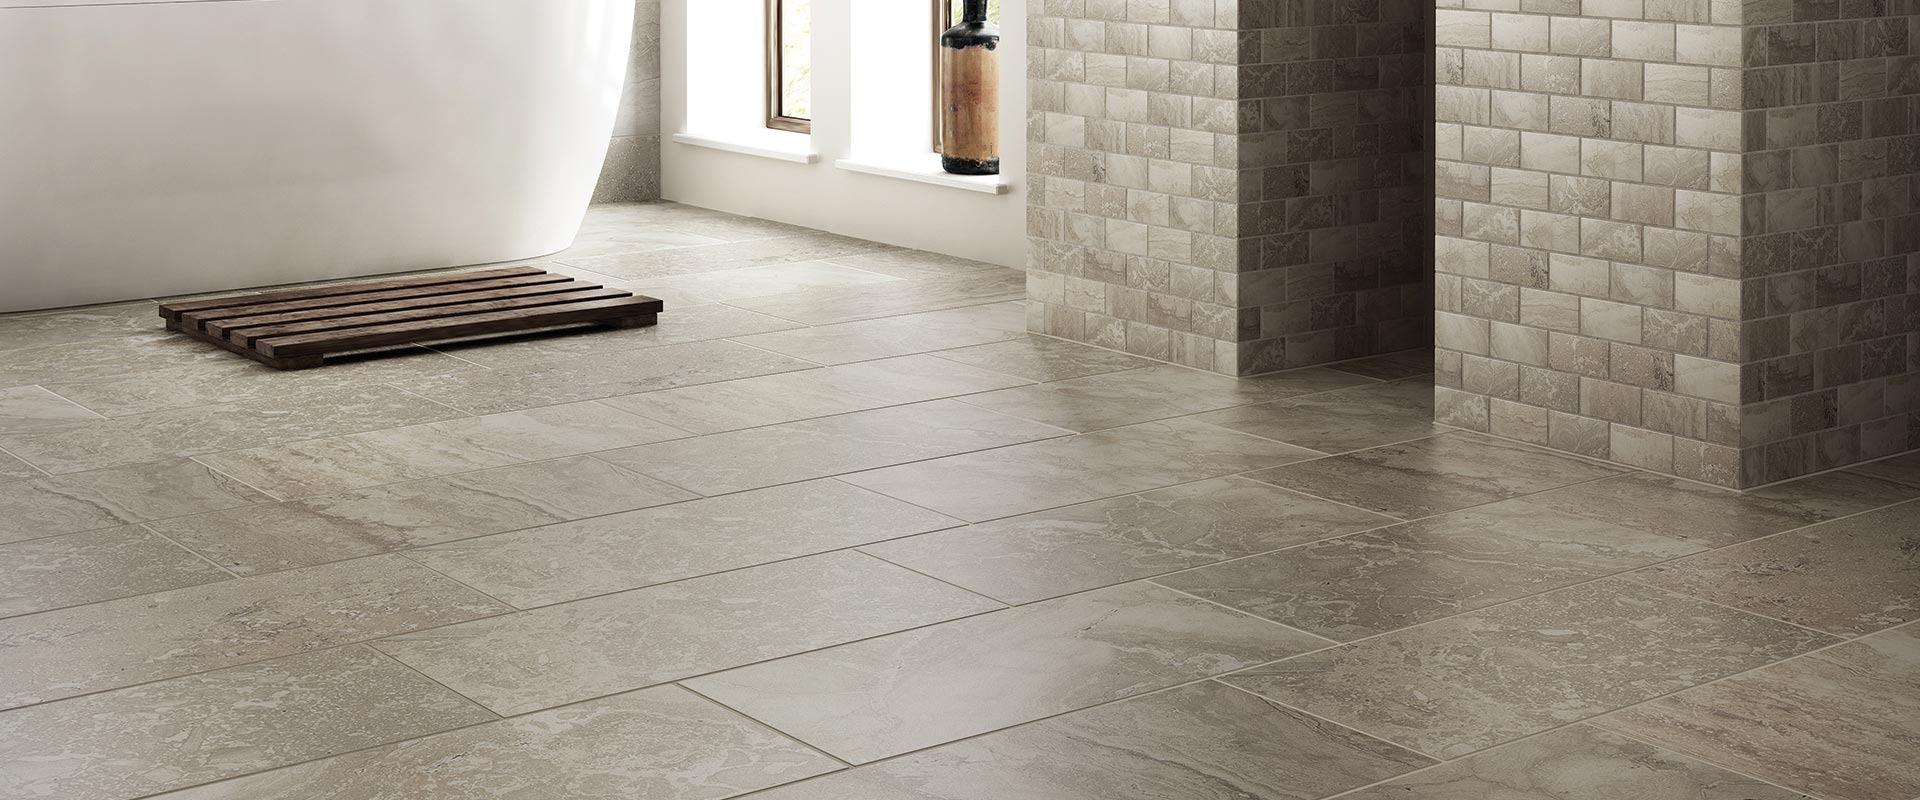 The Benefits Of Repairing Sealing Your Stone Floor Vip Stone